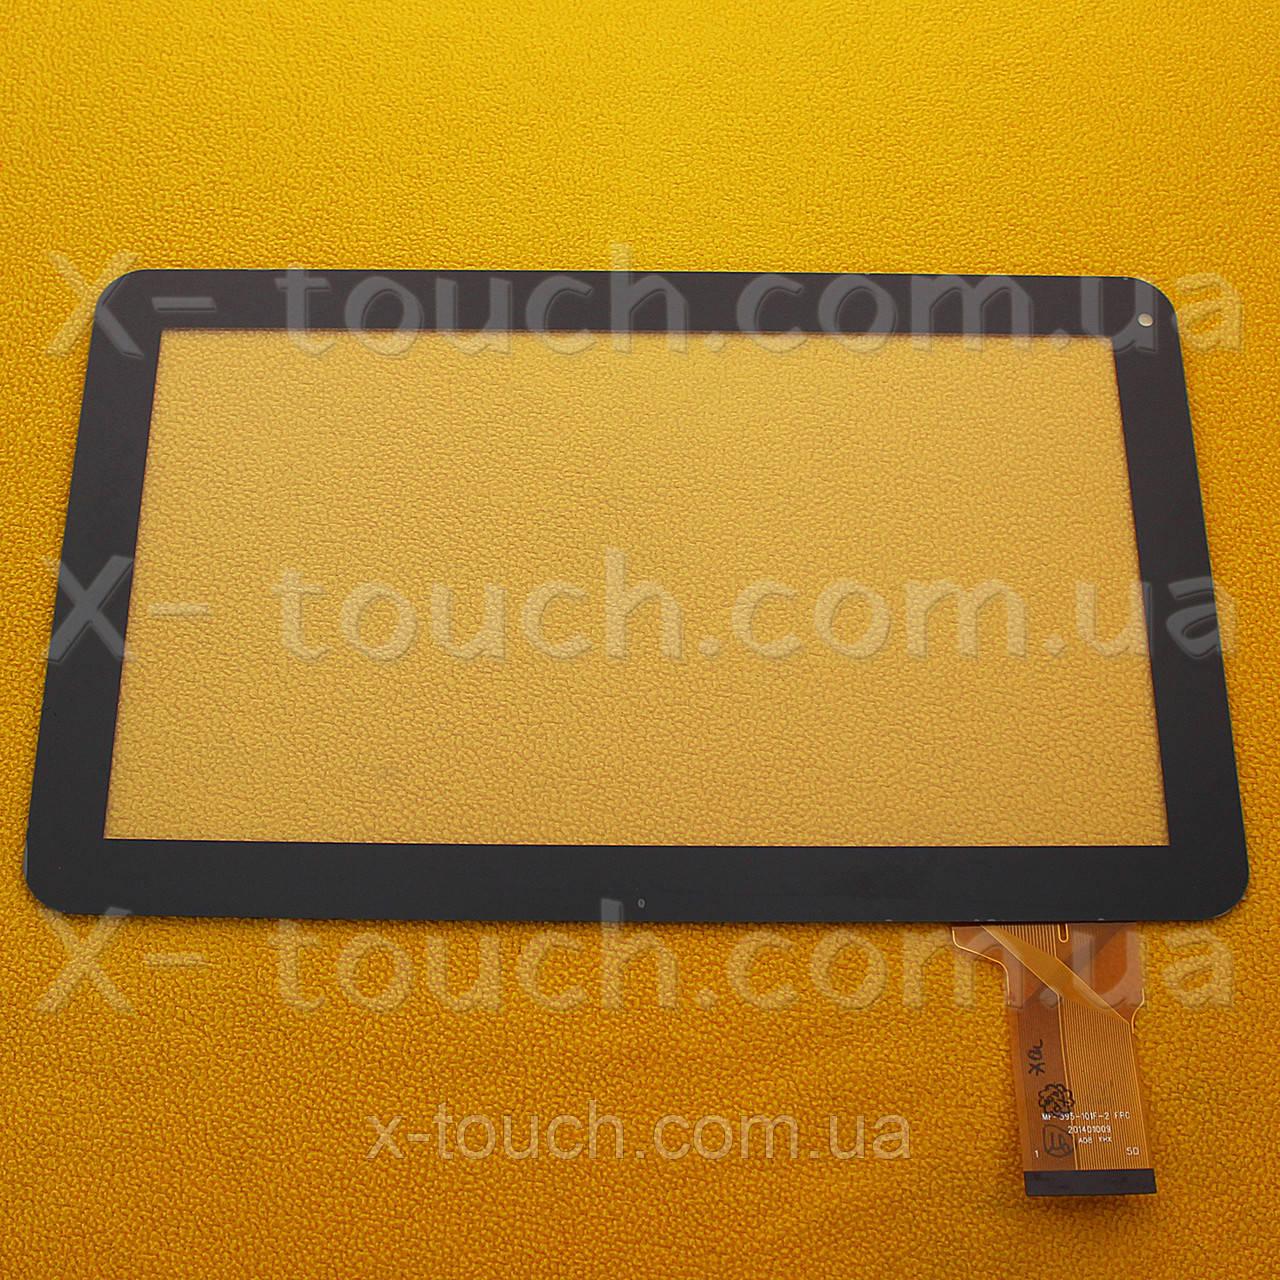 Тачскрин, сенсор  Globex GU1010c  для планшета